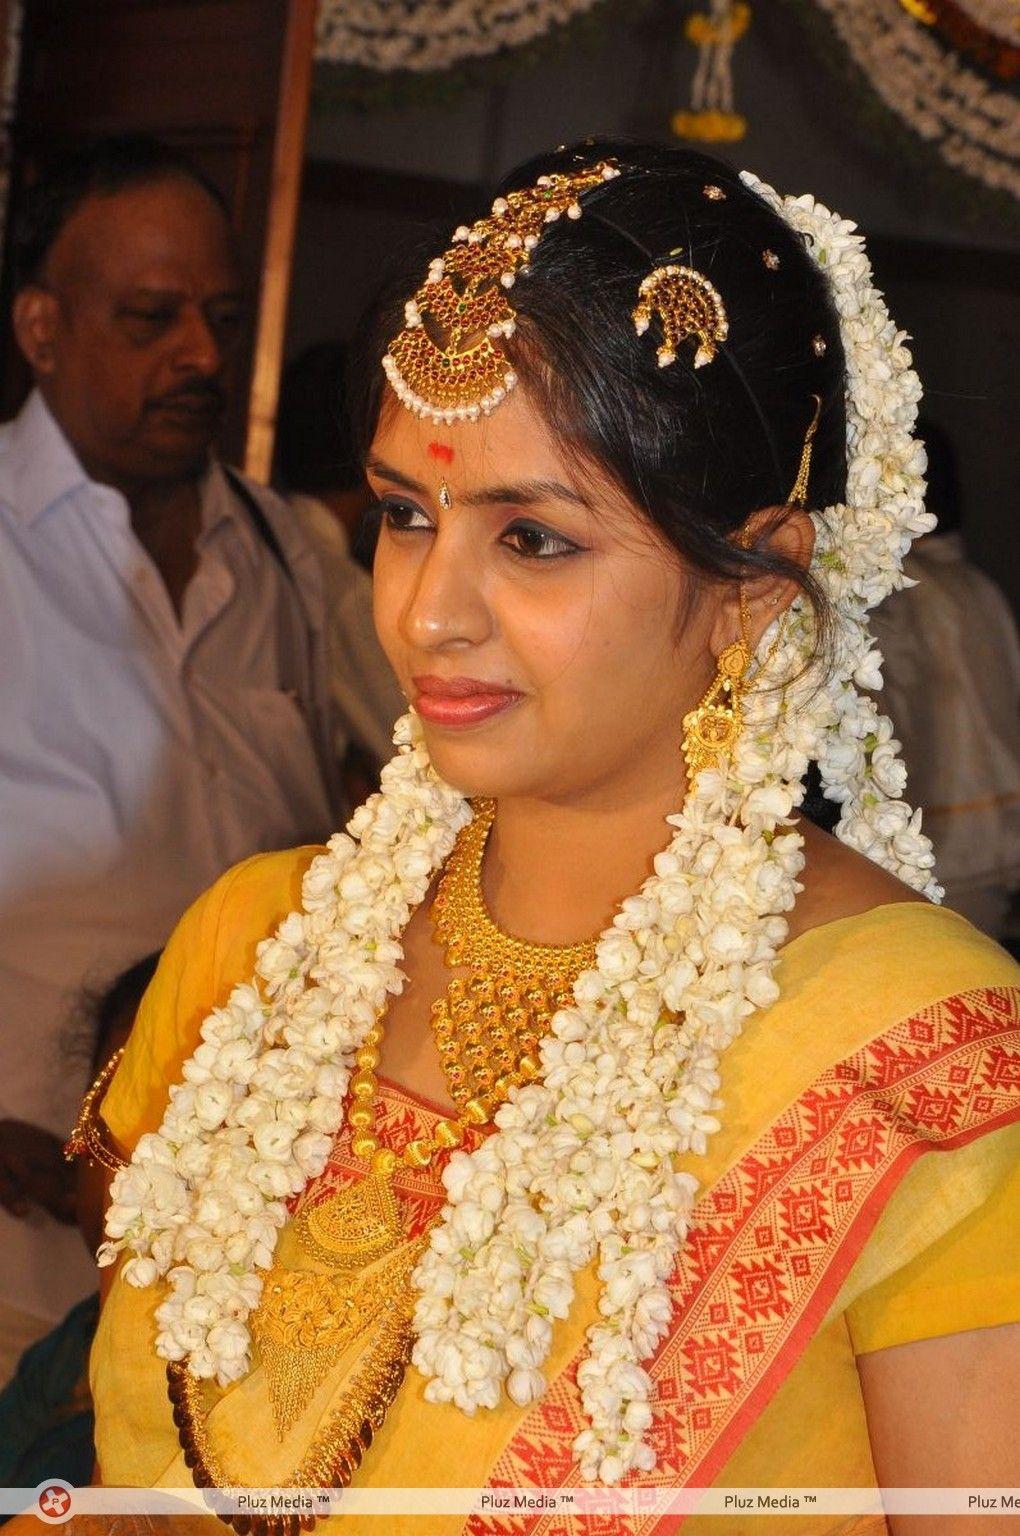 Director Jyothi Krishna - Aishwarya Wedding Stills for Jyothi Krishna Director  131fsj